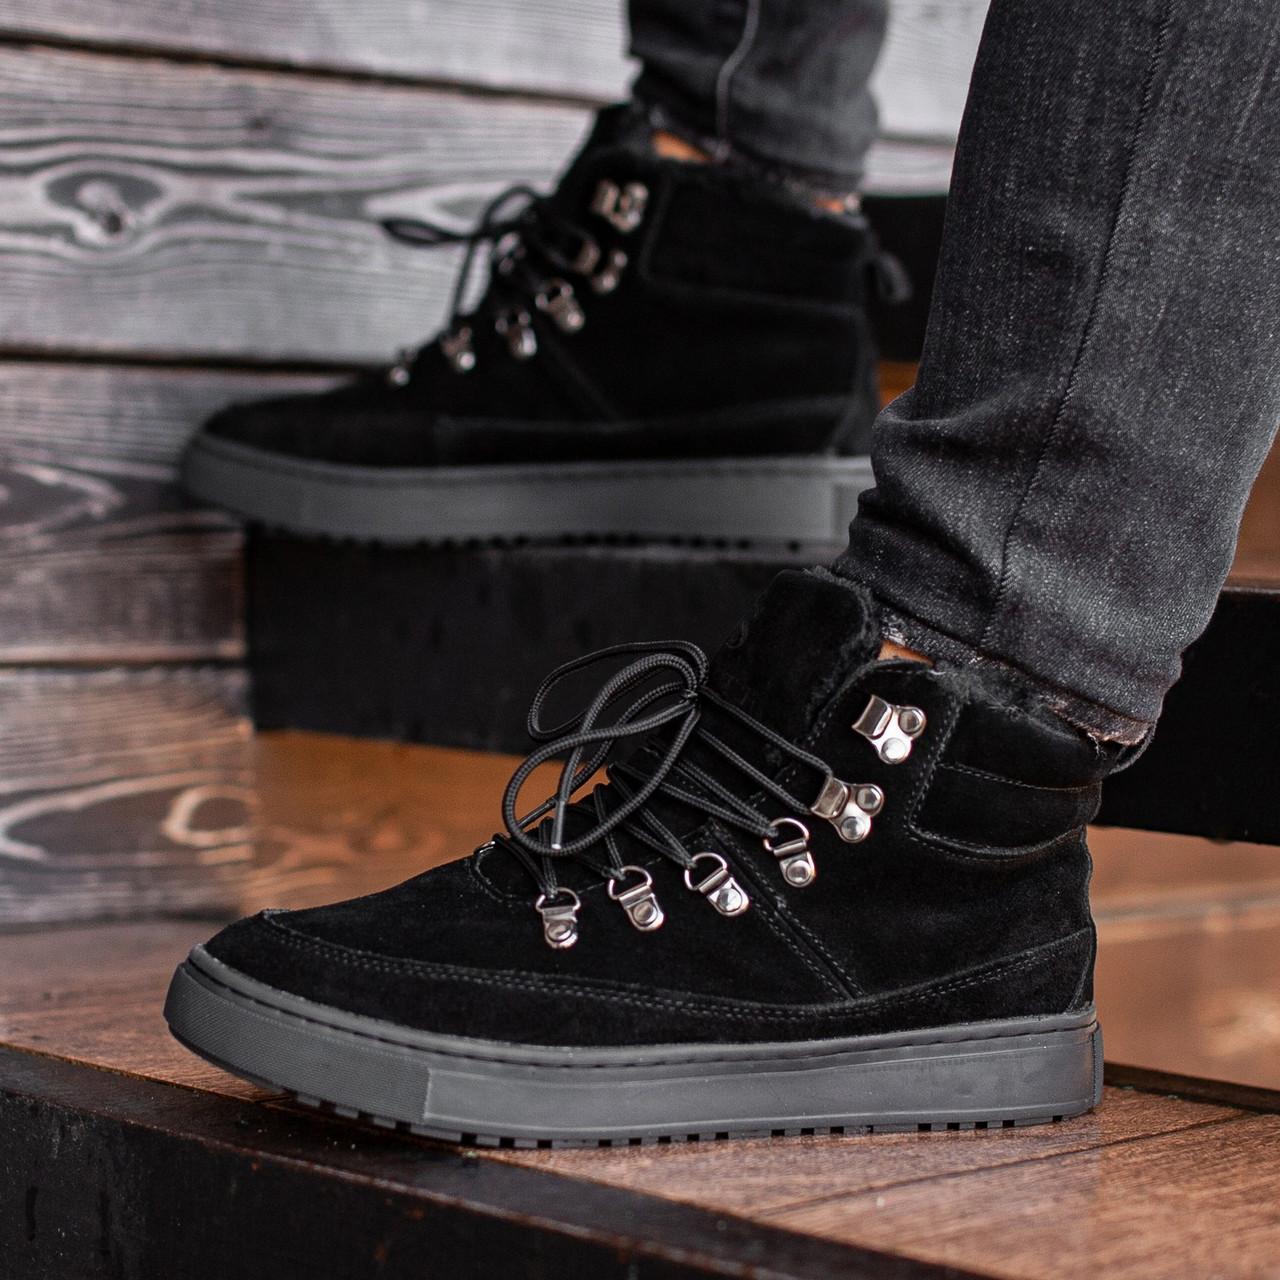 Ботинки мужские зимние South Snake 2.0 black, зимние классические ботинки